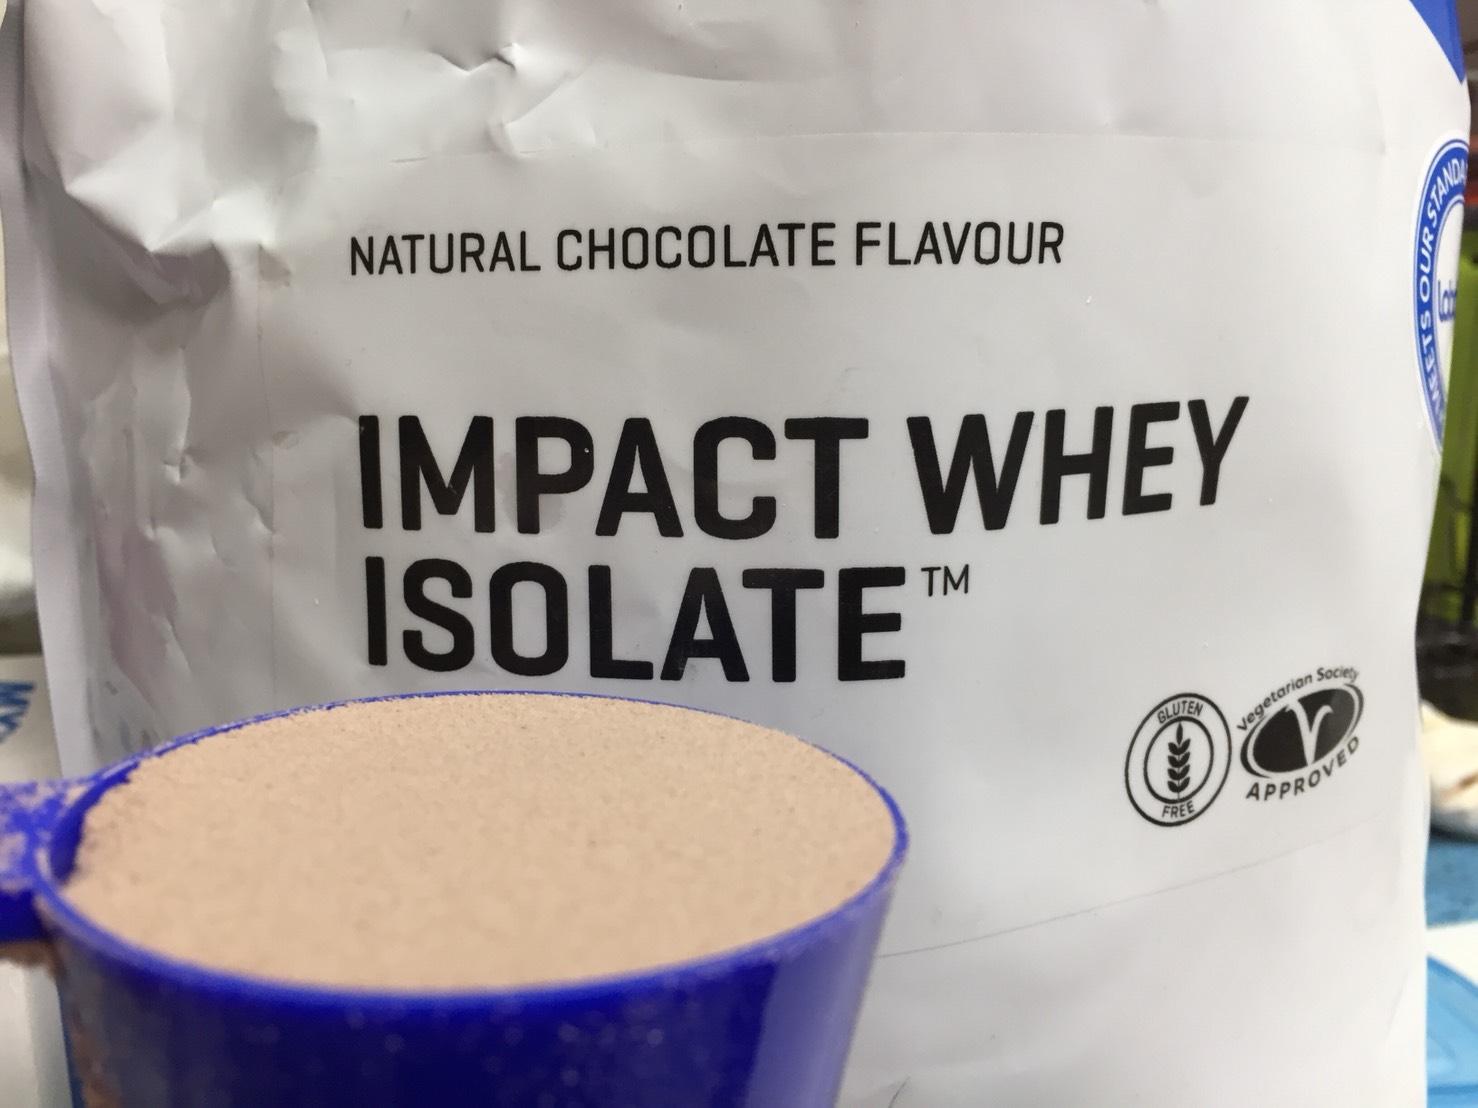 【WPI】IMPACT 分離ホエイプロテイン (アイソレート)「NATURAL CHOCOLATE FLAVOUR(ナチュラルチョコレート味)」の様子